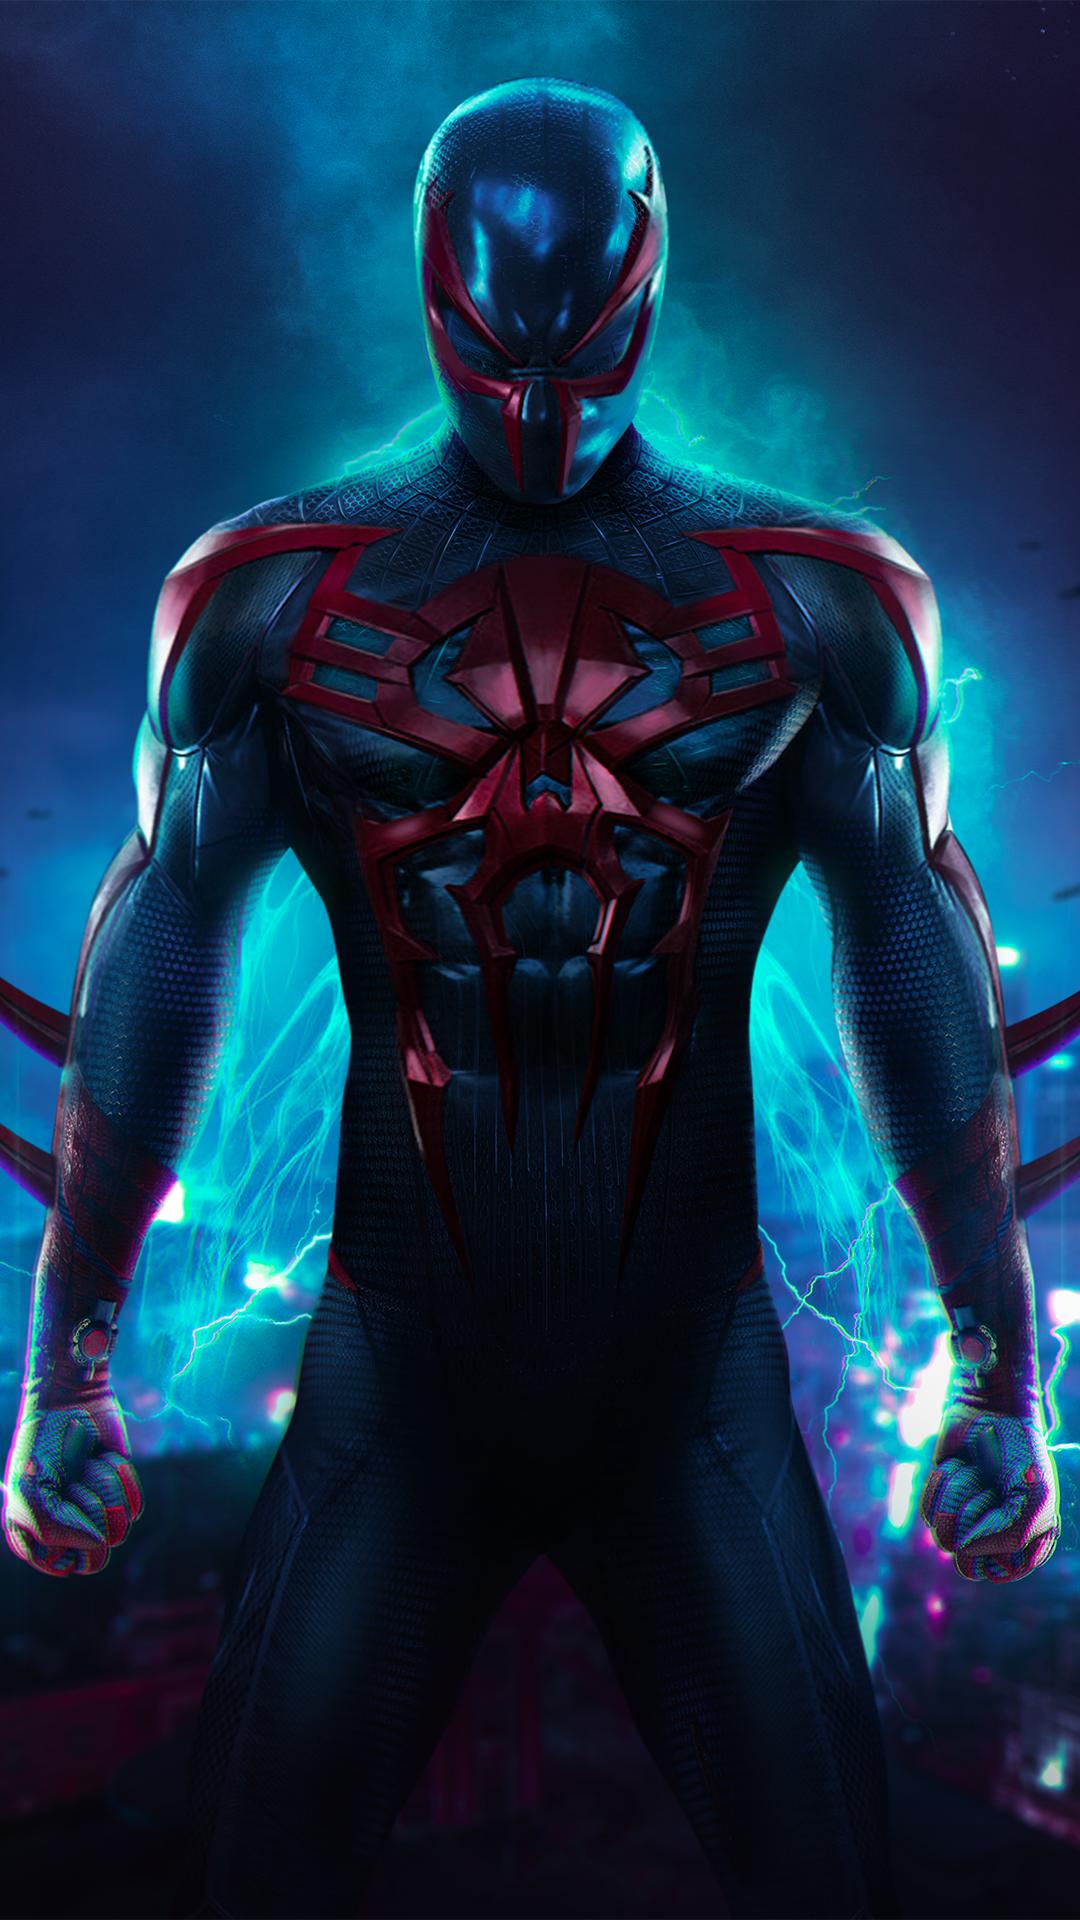 Spider-Man 2099 Wallpaper - iPhone 12 Pro Max